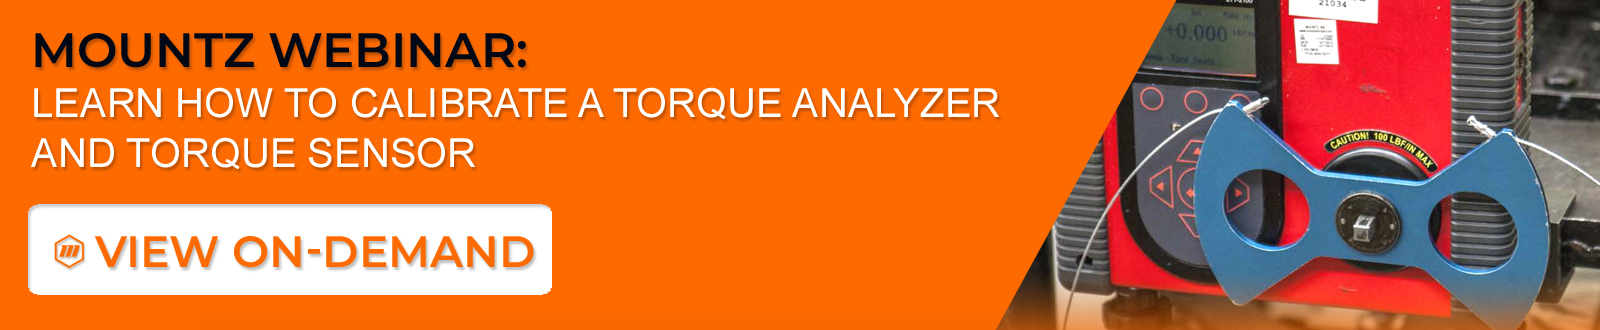 Calibrate-Analyzer-Category-Banner-Desktop-post-event